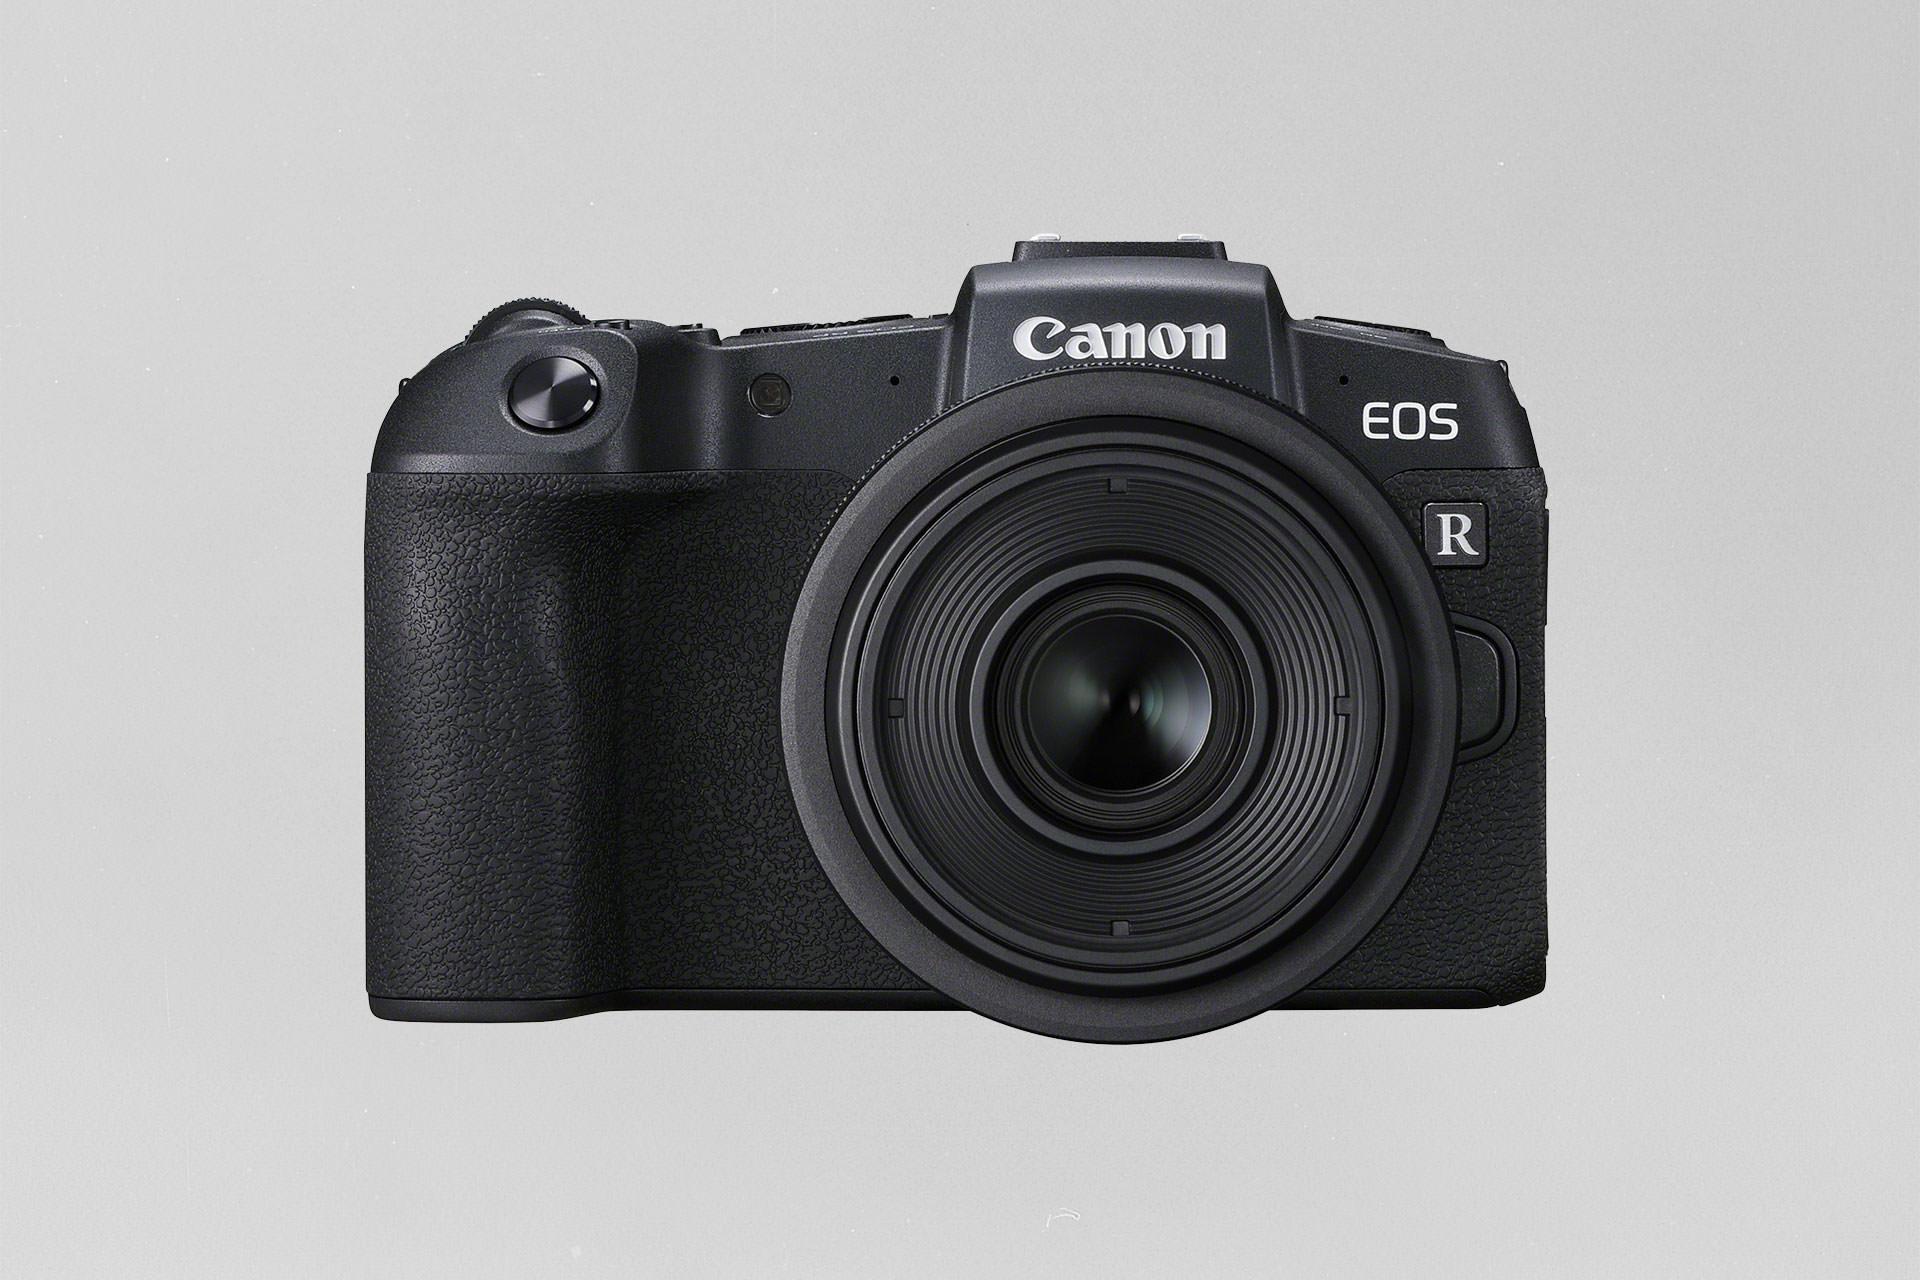 Neue Spiegellose Systemkamera: Canon EOS RP